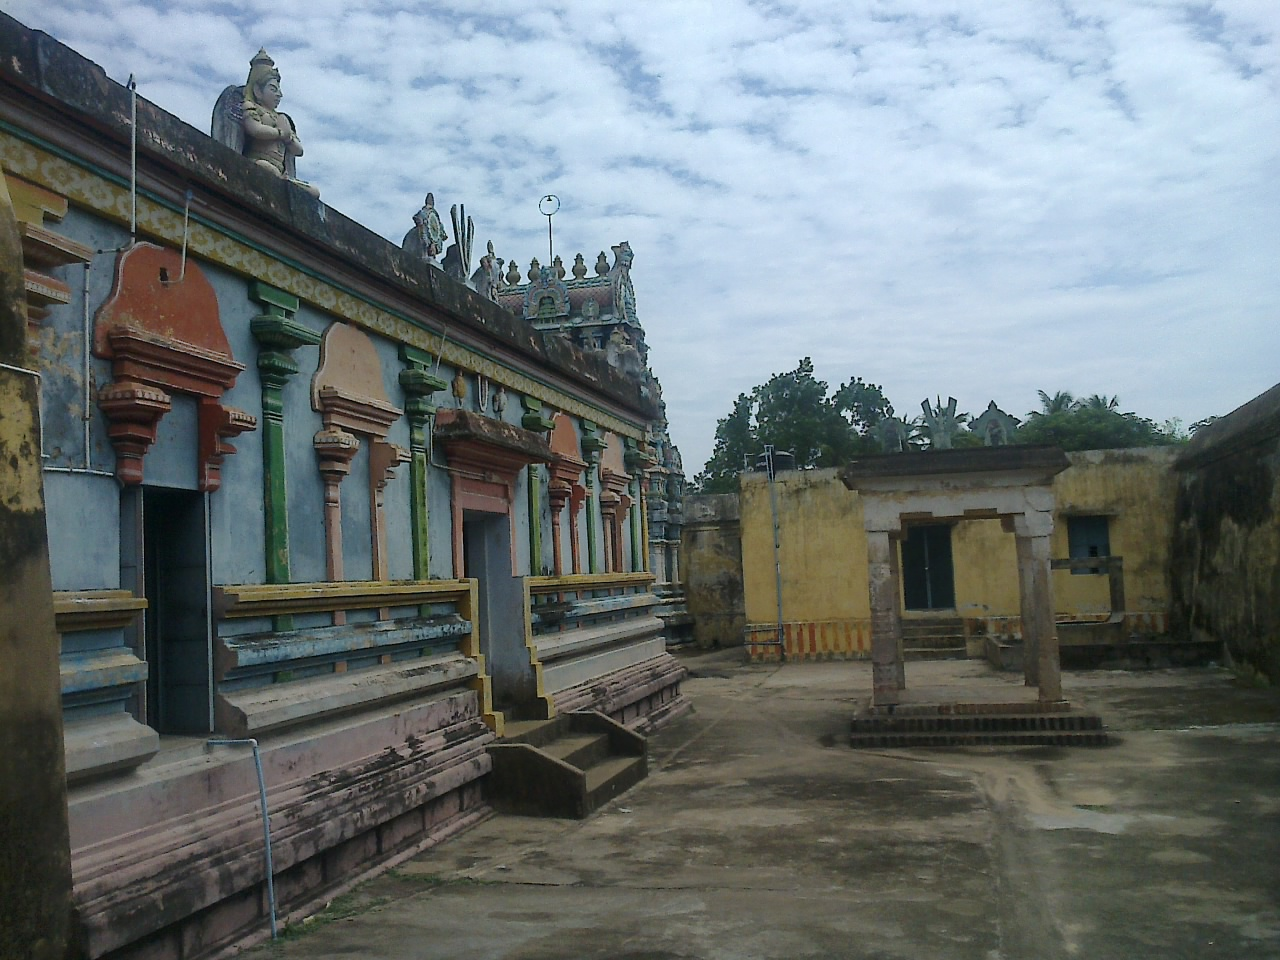 Sri Kolavilli Ramar Temple (Thiruvelliyankudi), Thanjavur - Divya Desam 08